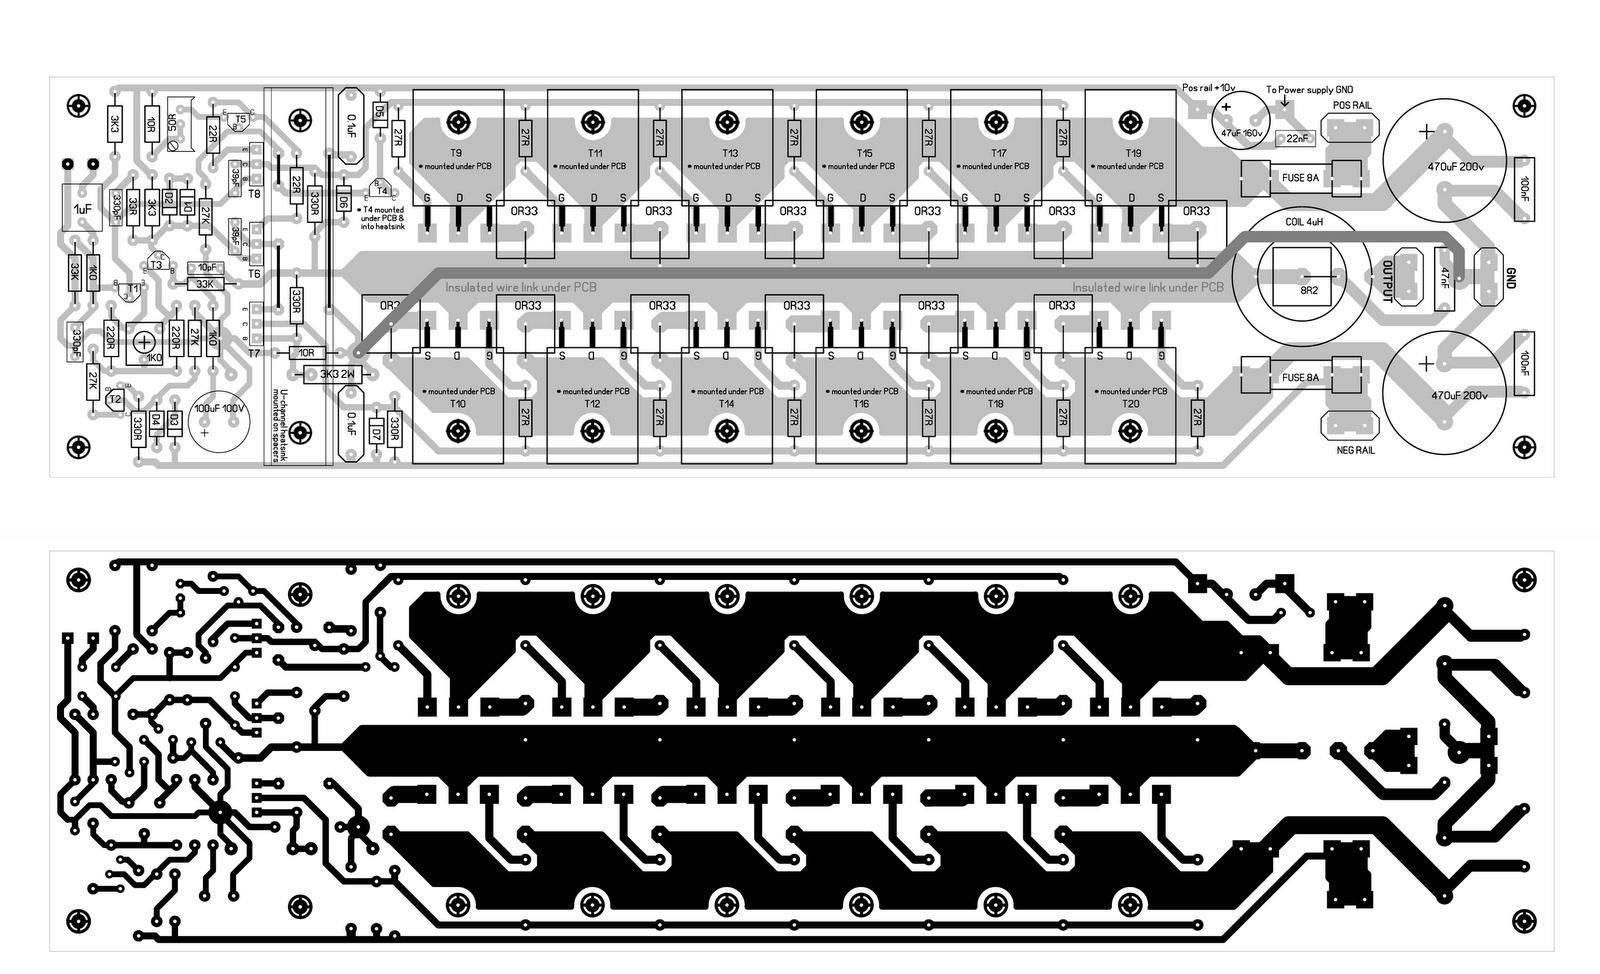 Planet Audio Schematic Amp Wiring Diagram Free Car Power Circuit With Design Blogspot Com Boss Watt